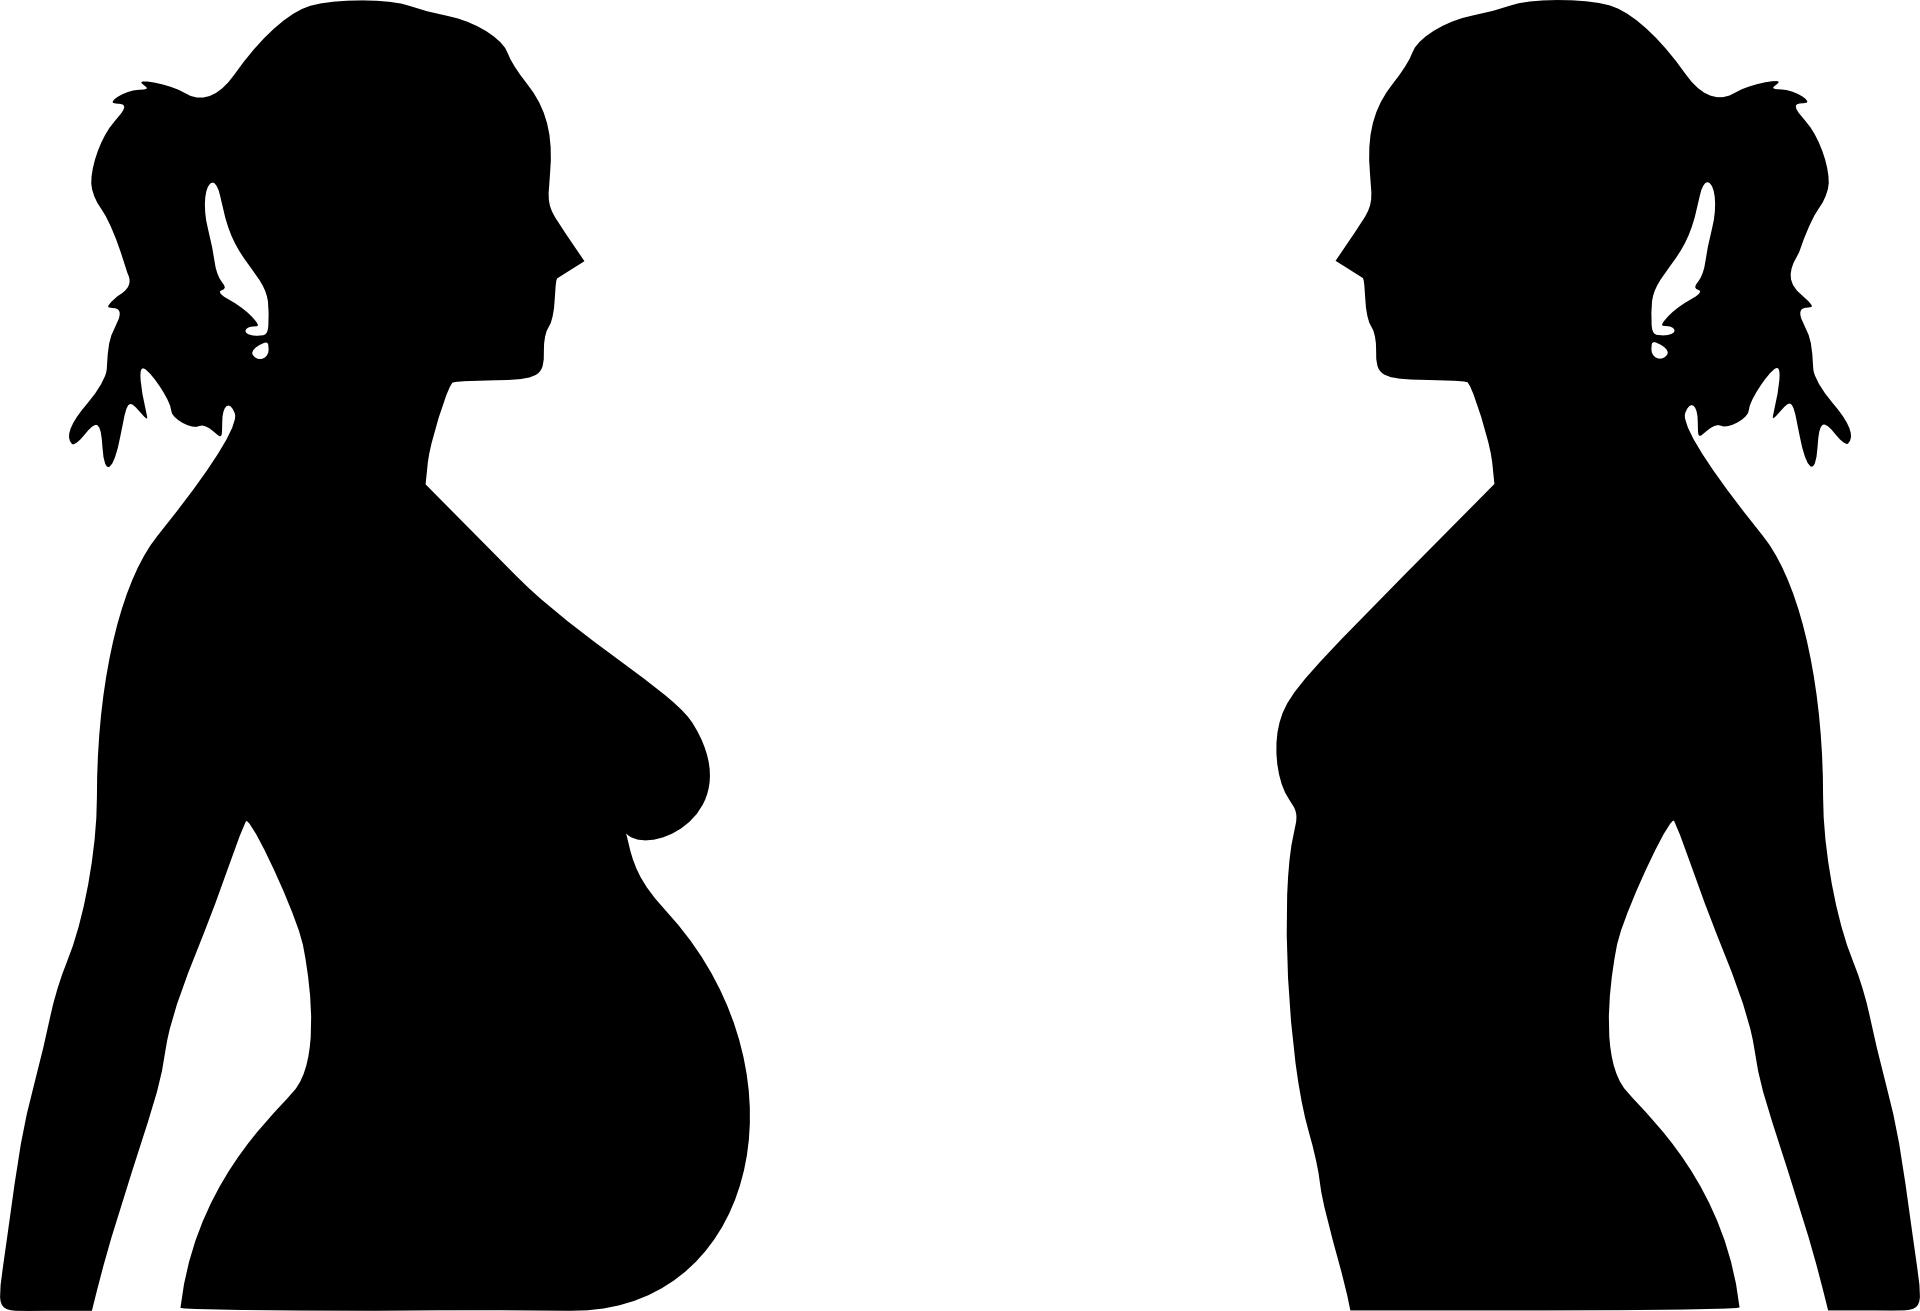 Pregnant woman & non-pregnant women silhouette vector